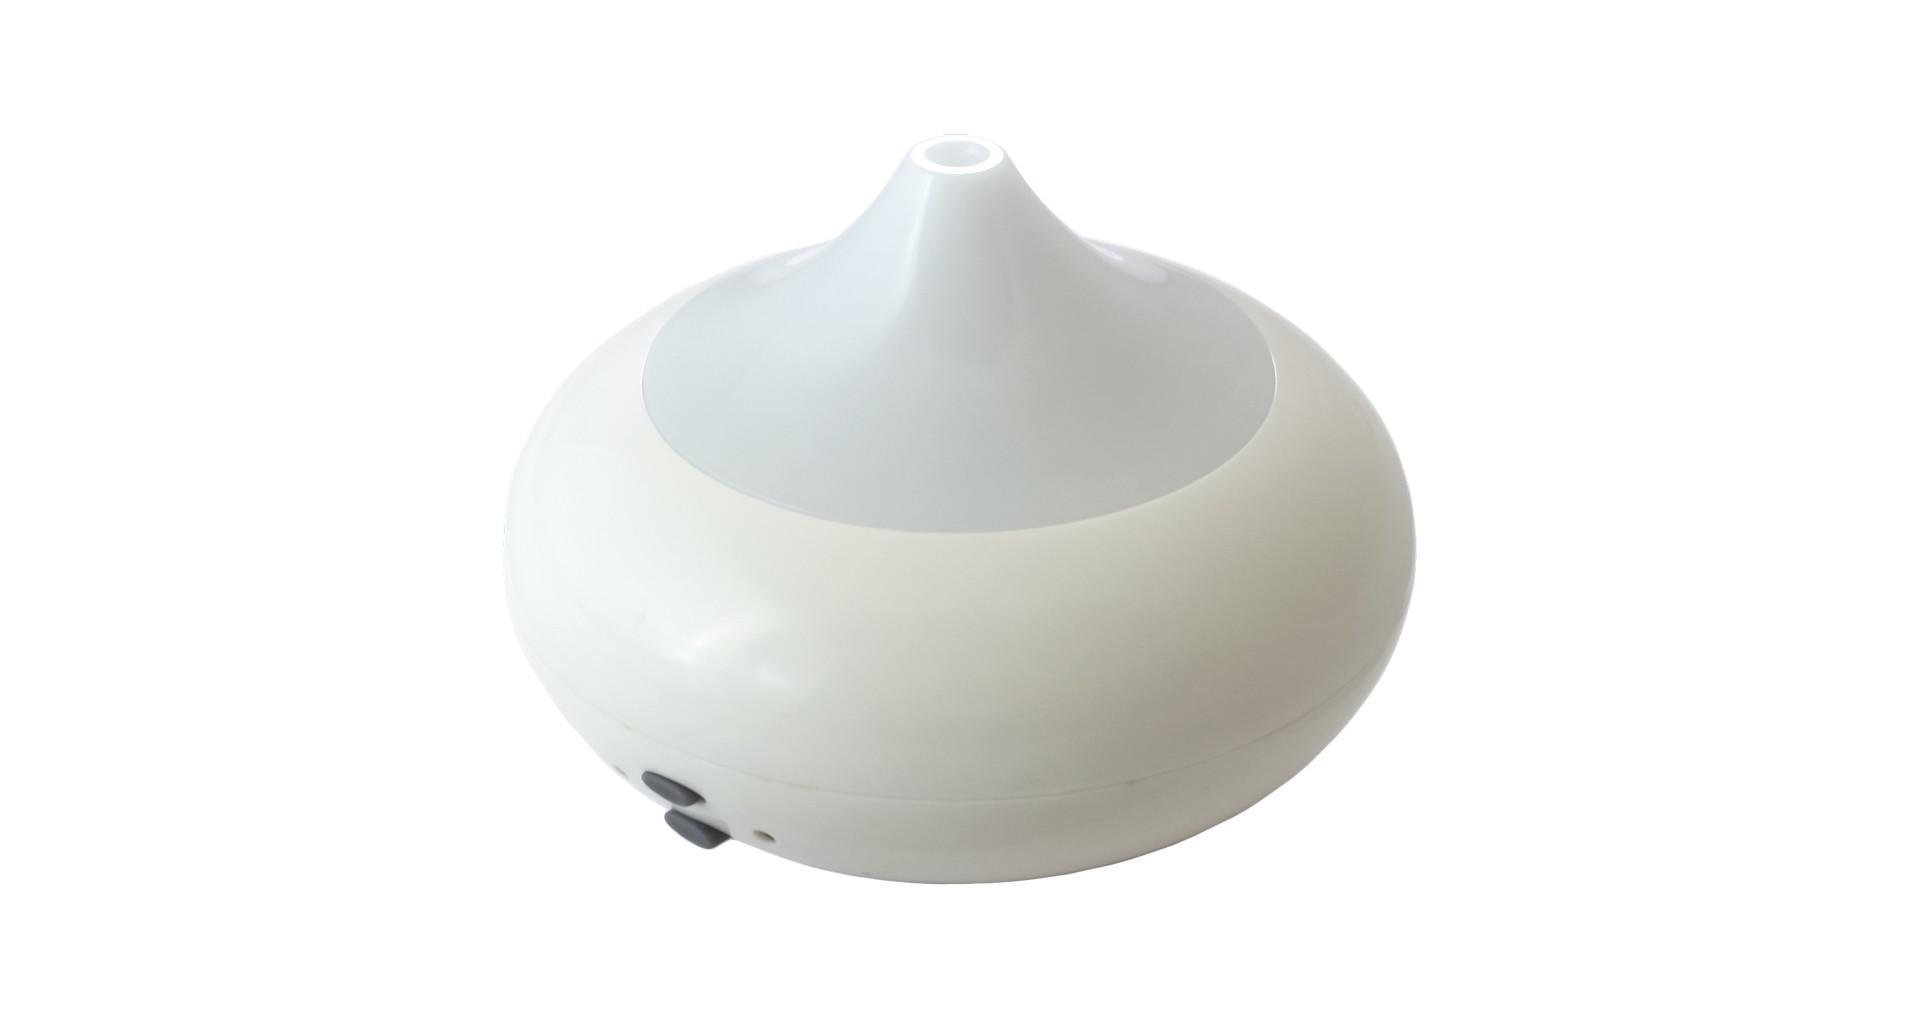 Аромадиффузор увлажнитель воздуха Elite - Aromatherapy Machine EL-507 3